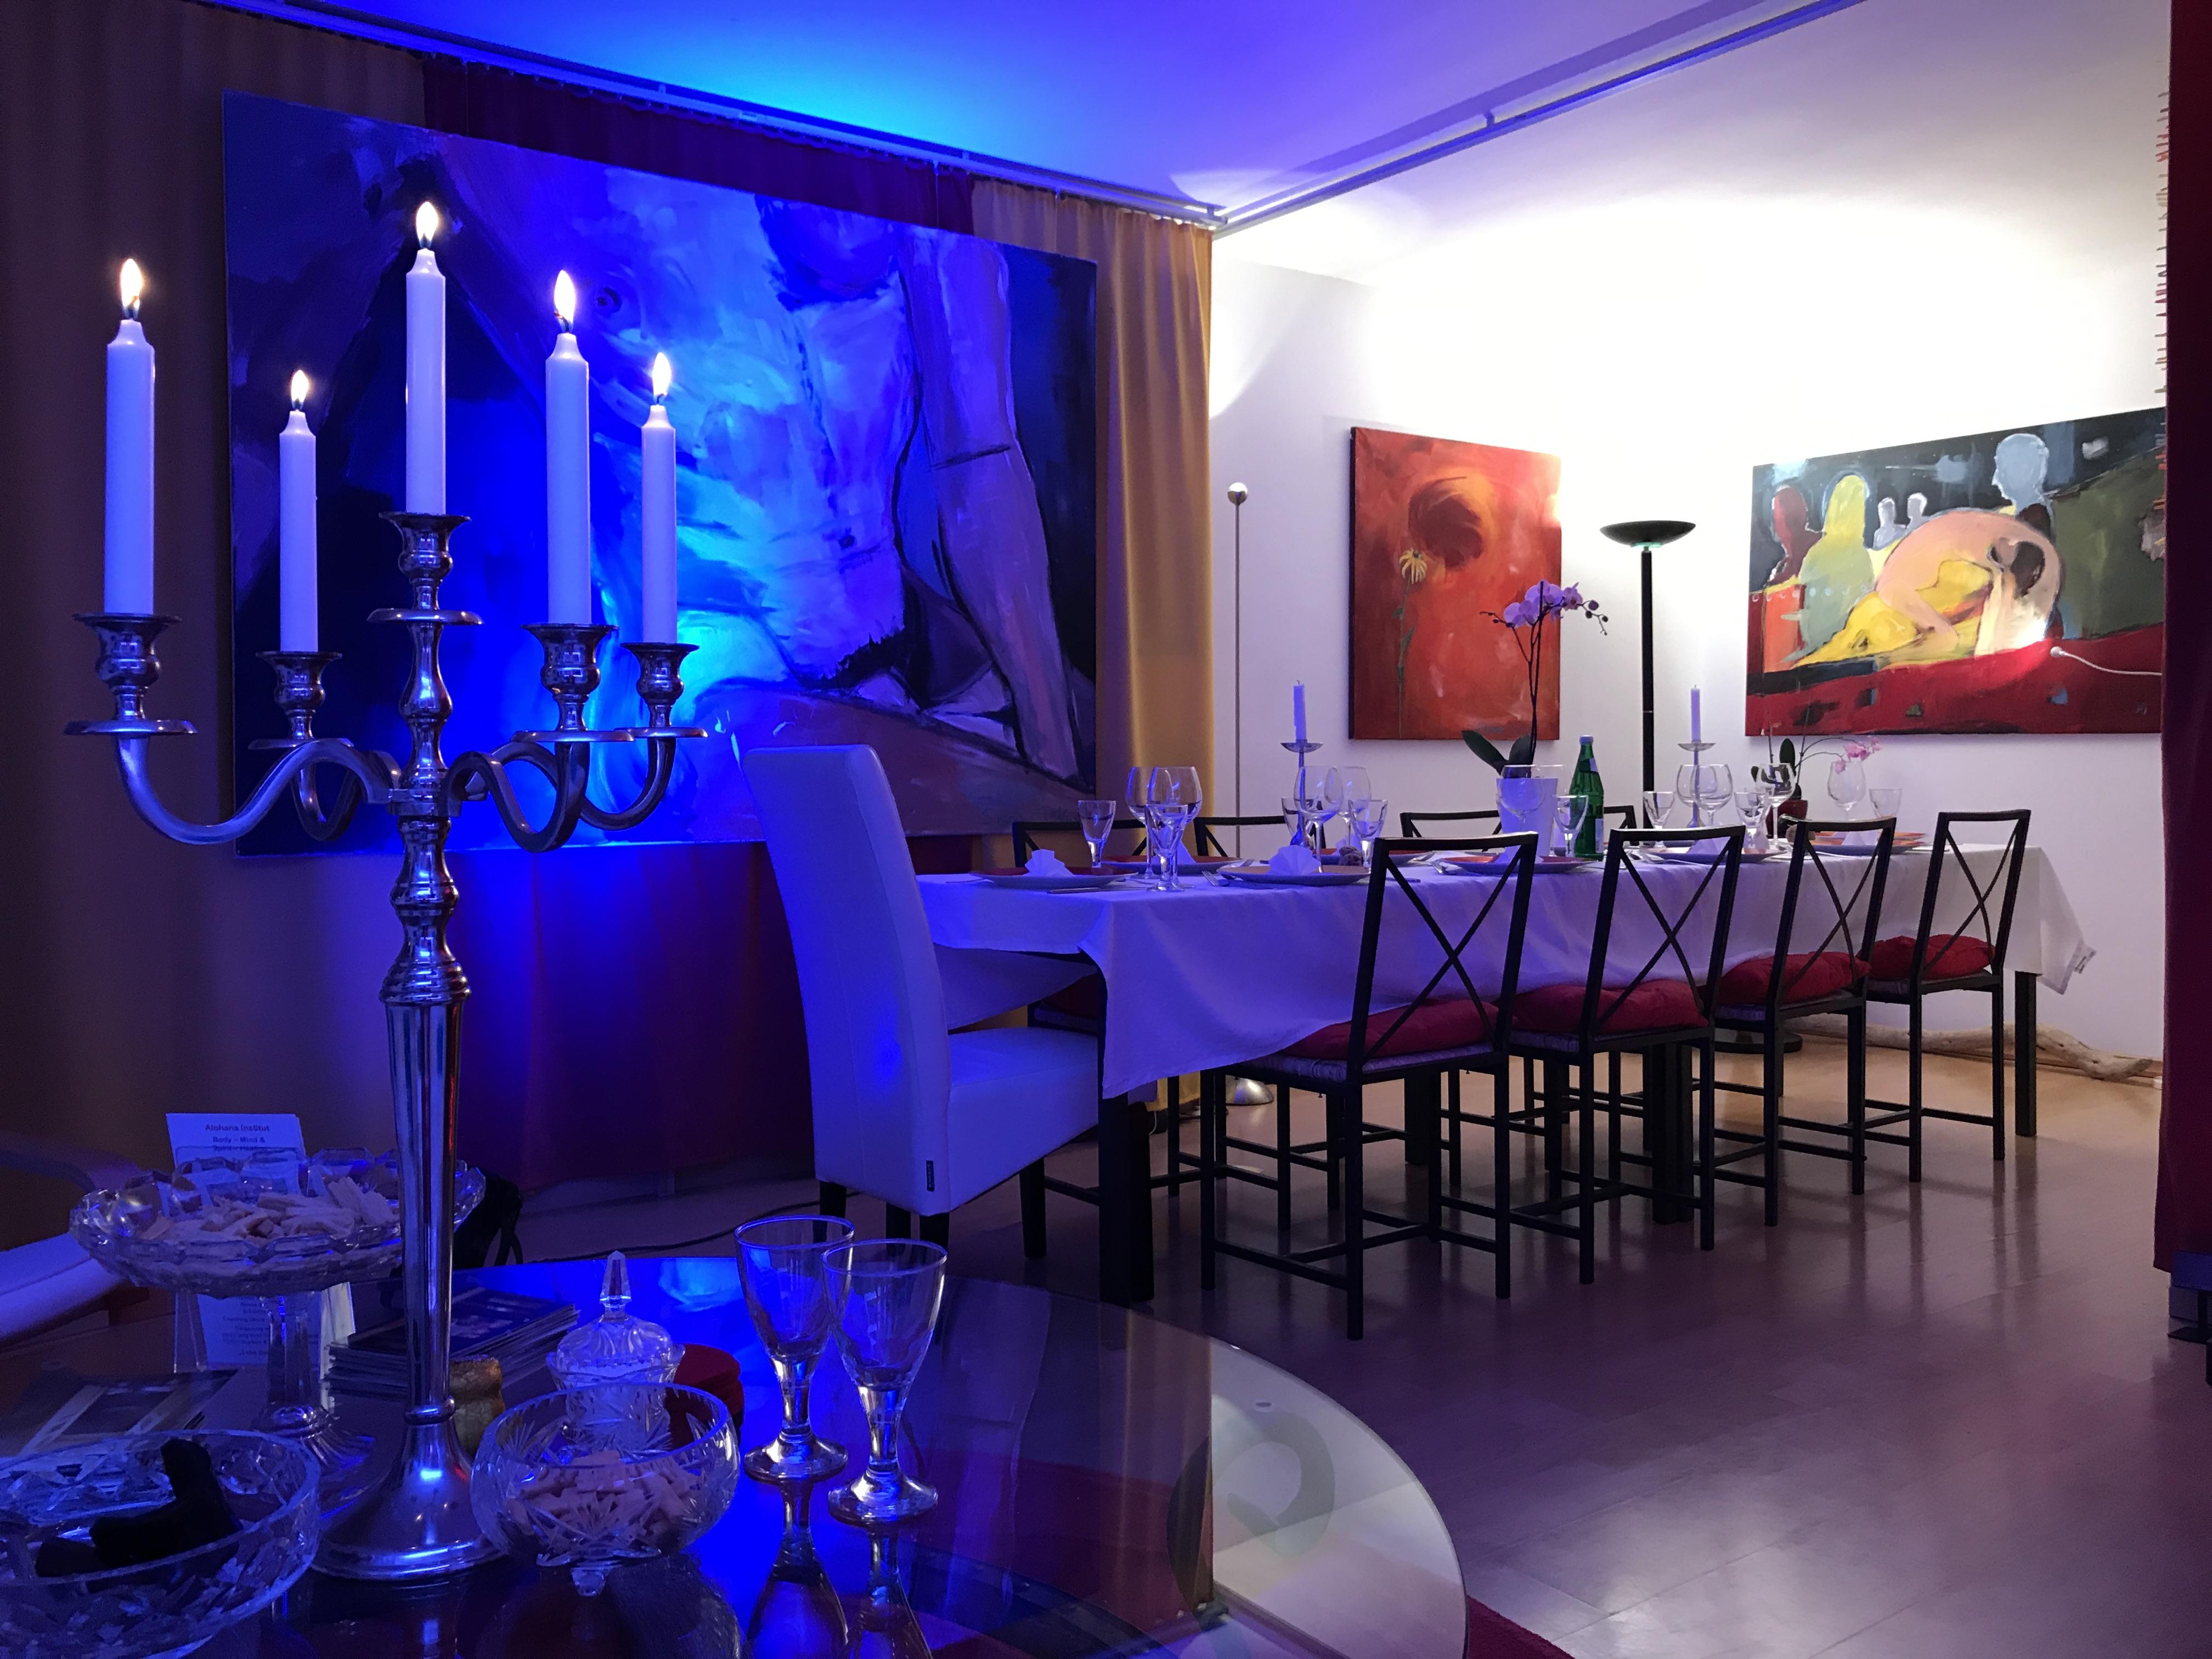 Art Dinner at art Gallery Susanne Rikus